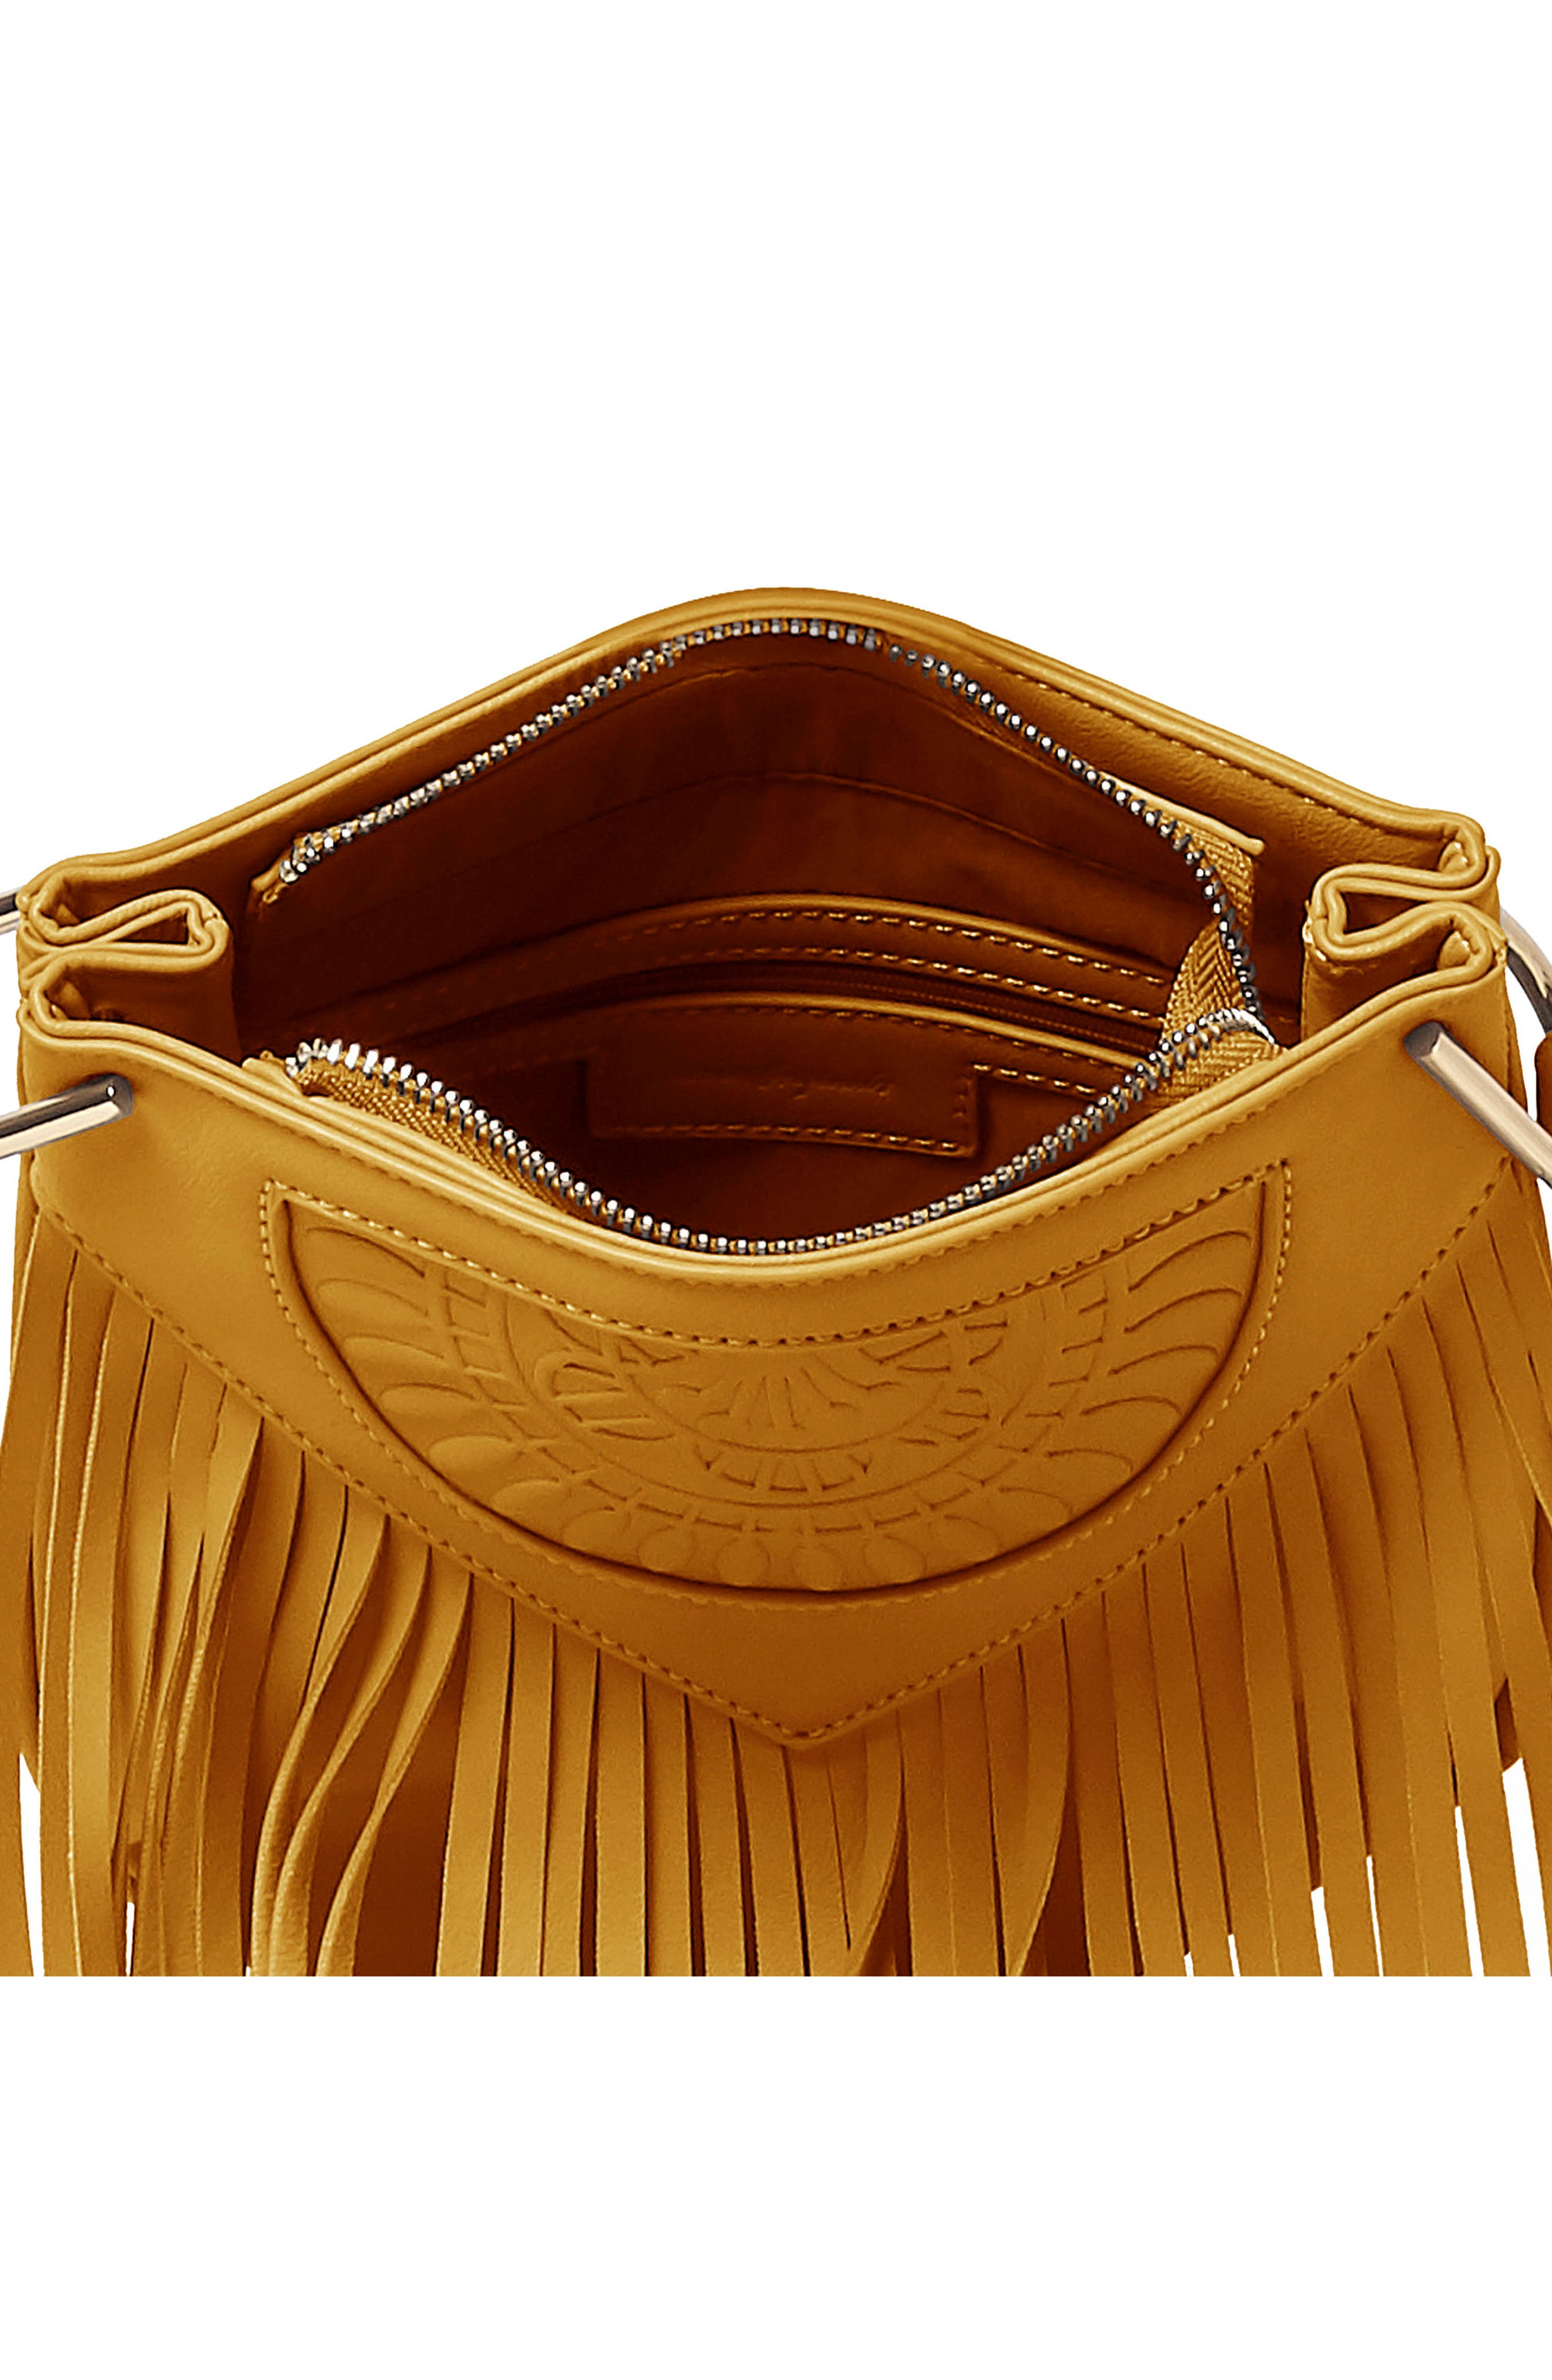 Rose Queen Vegan Leather Crossbody Bag,                             Alternate thumbnail 2, color,                             Mustard